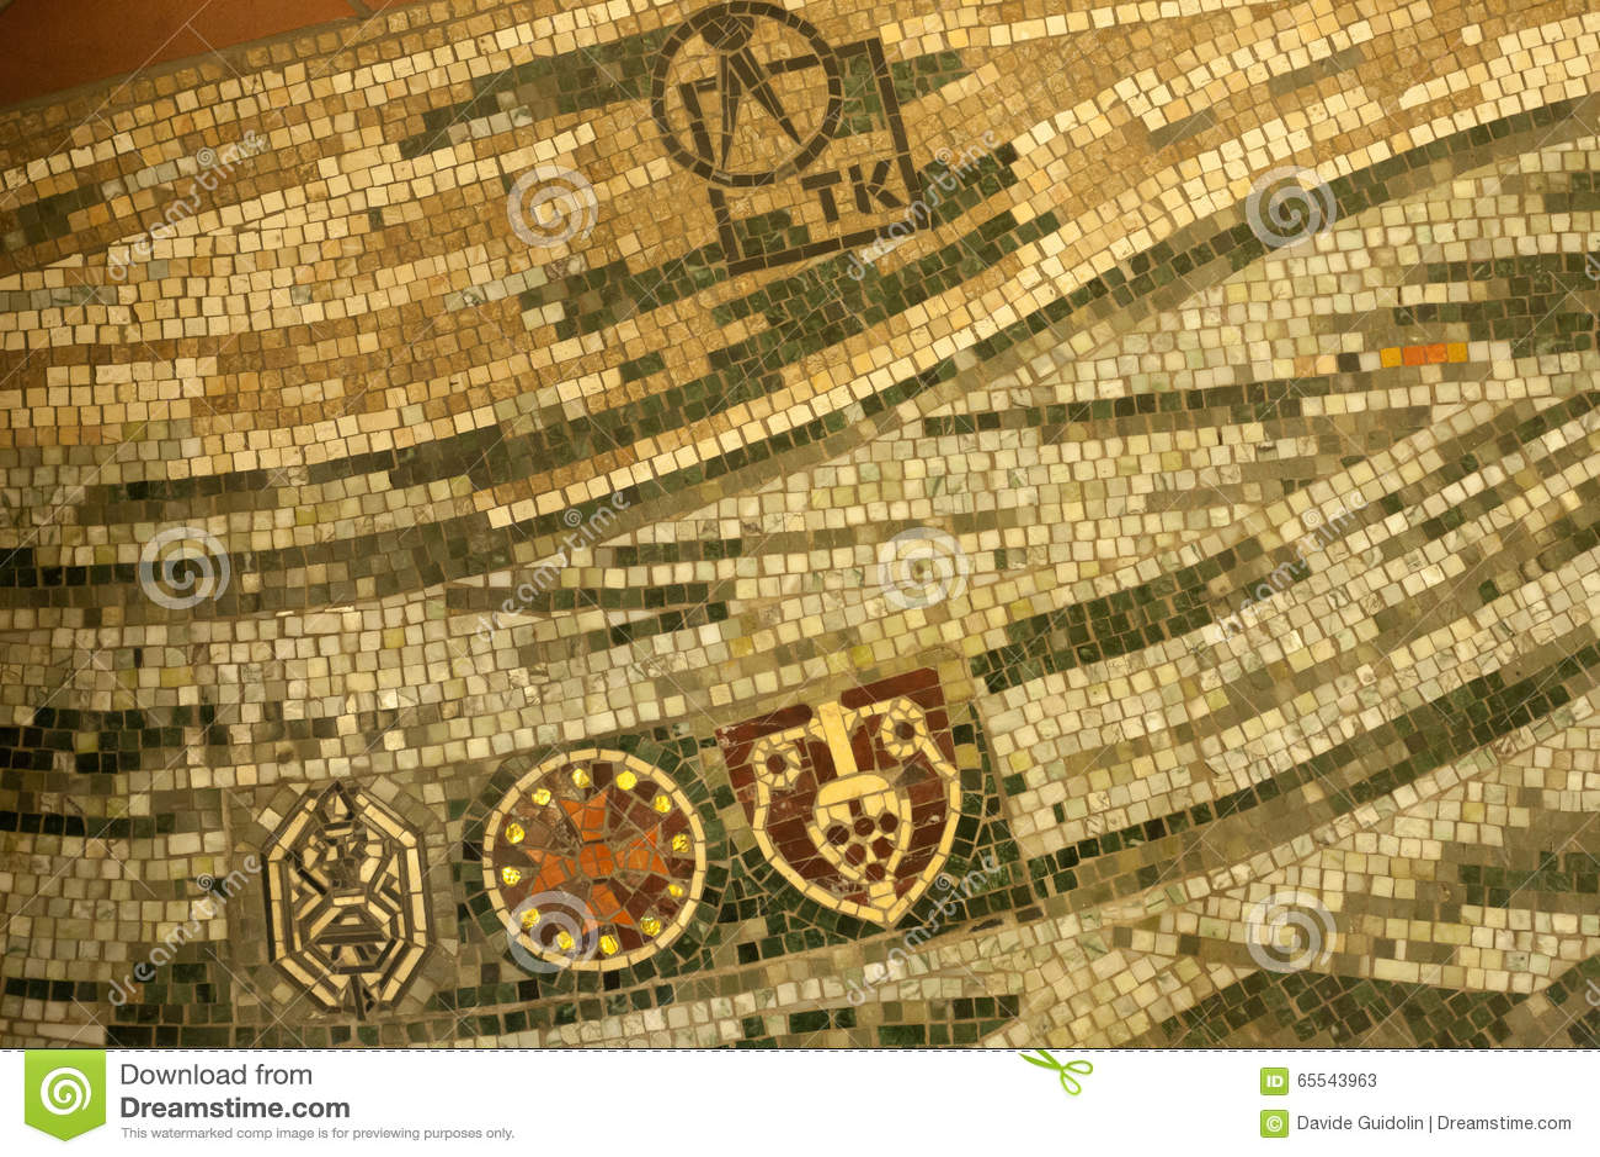 Mosaikfußbodendetail